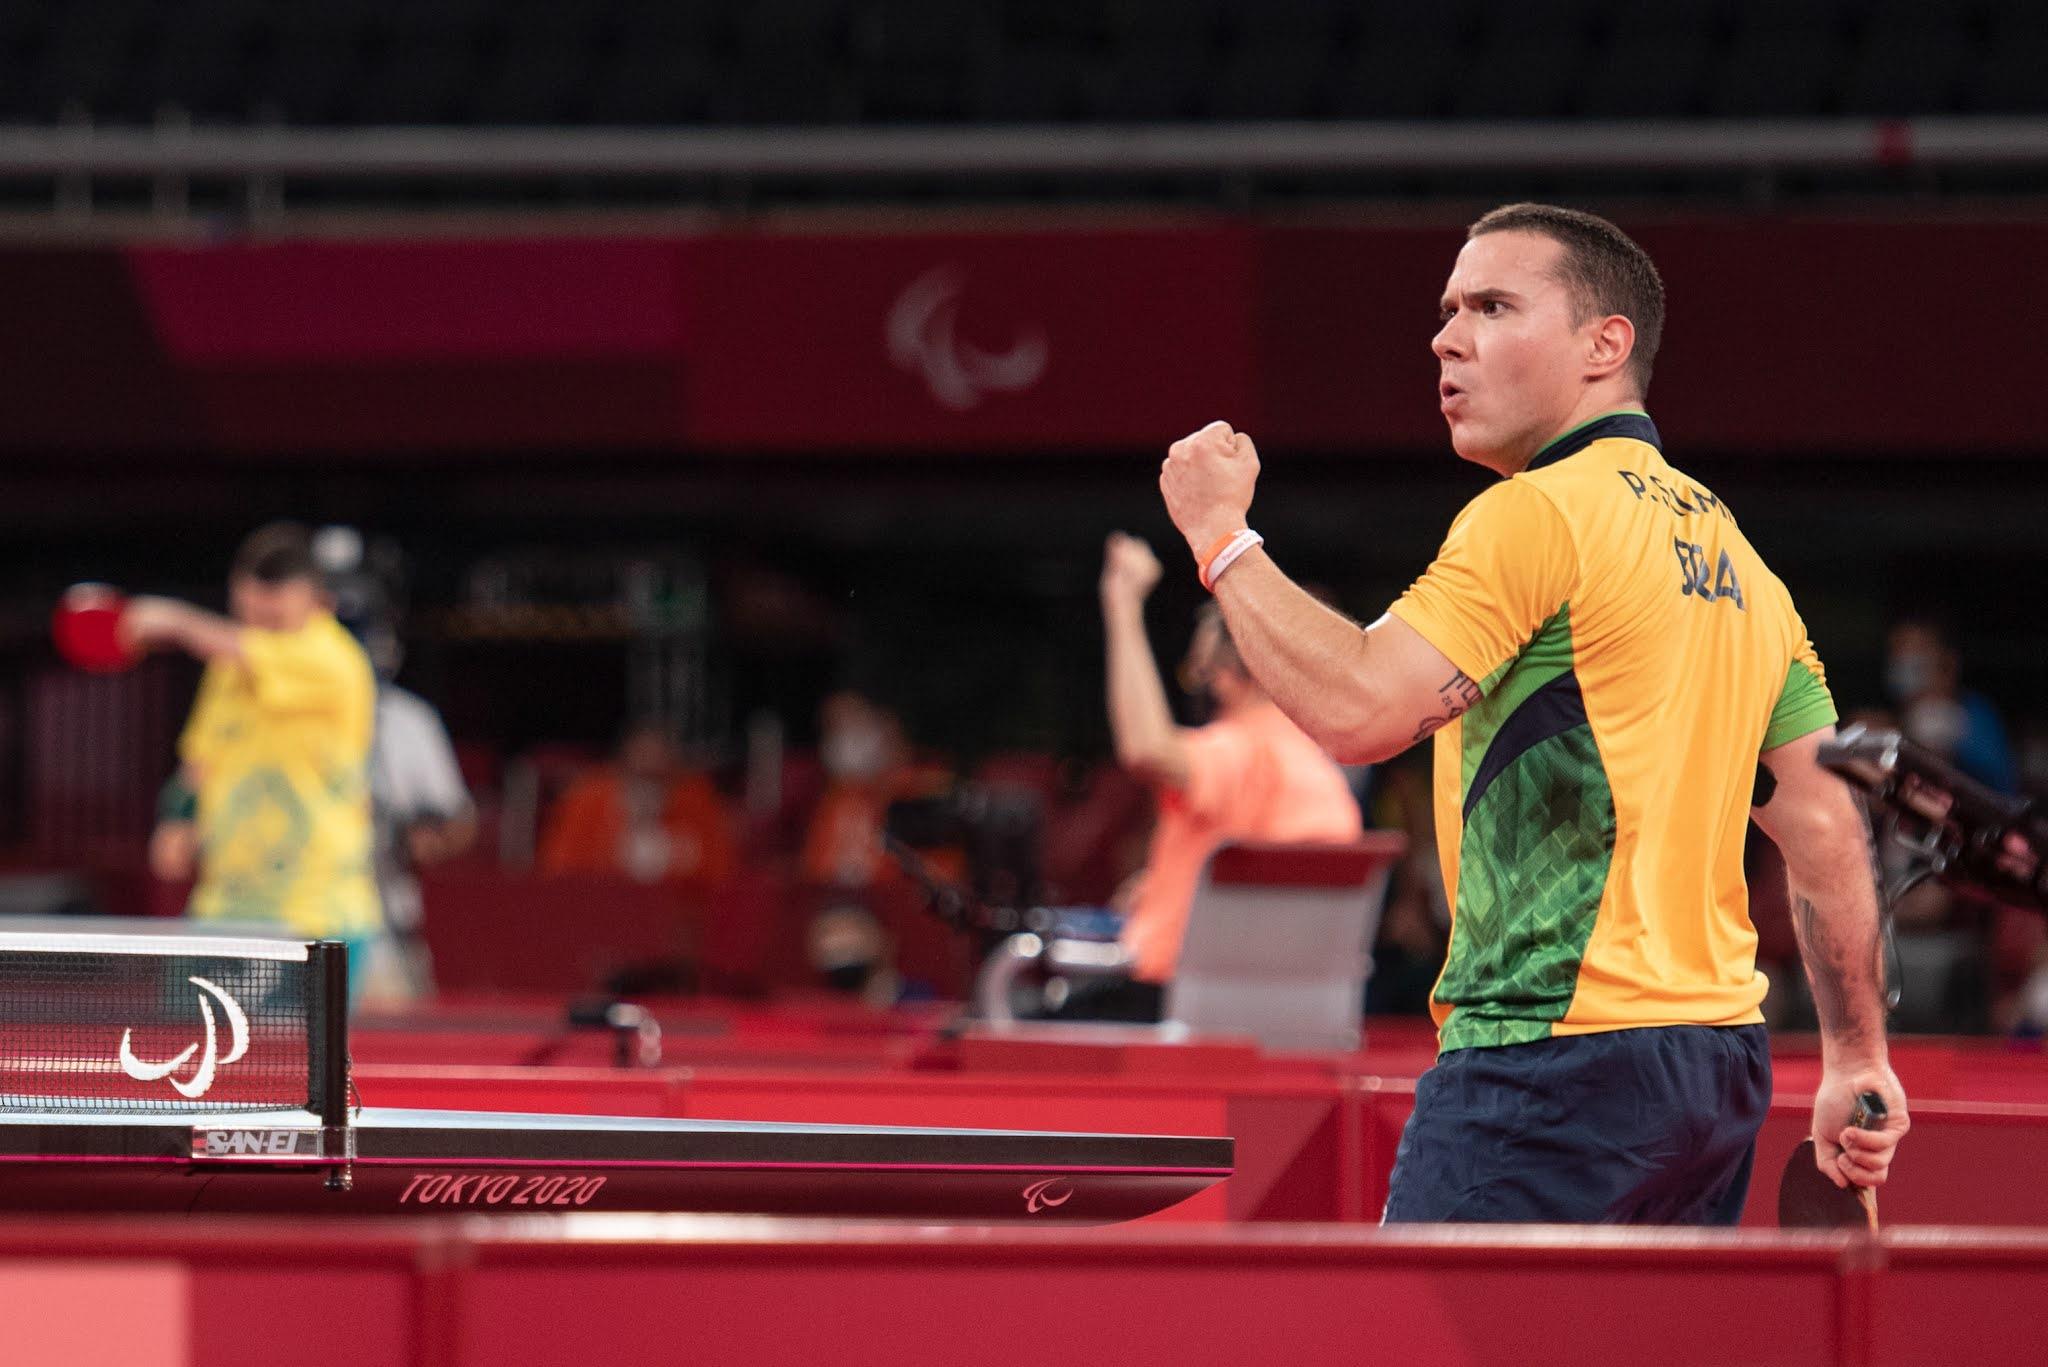 Paulo Salmin, quase que de costas para foto, vibra de punhos cerrados; ele está de camiseta amarela